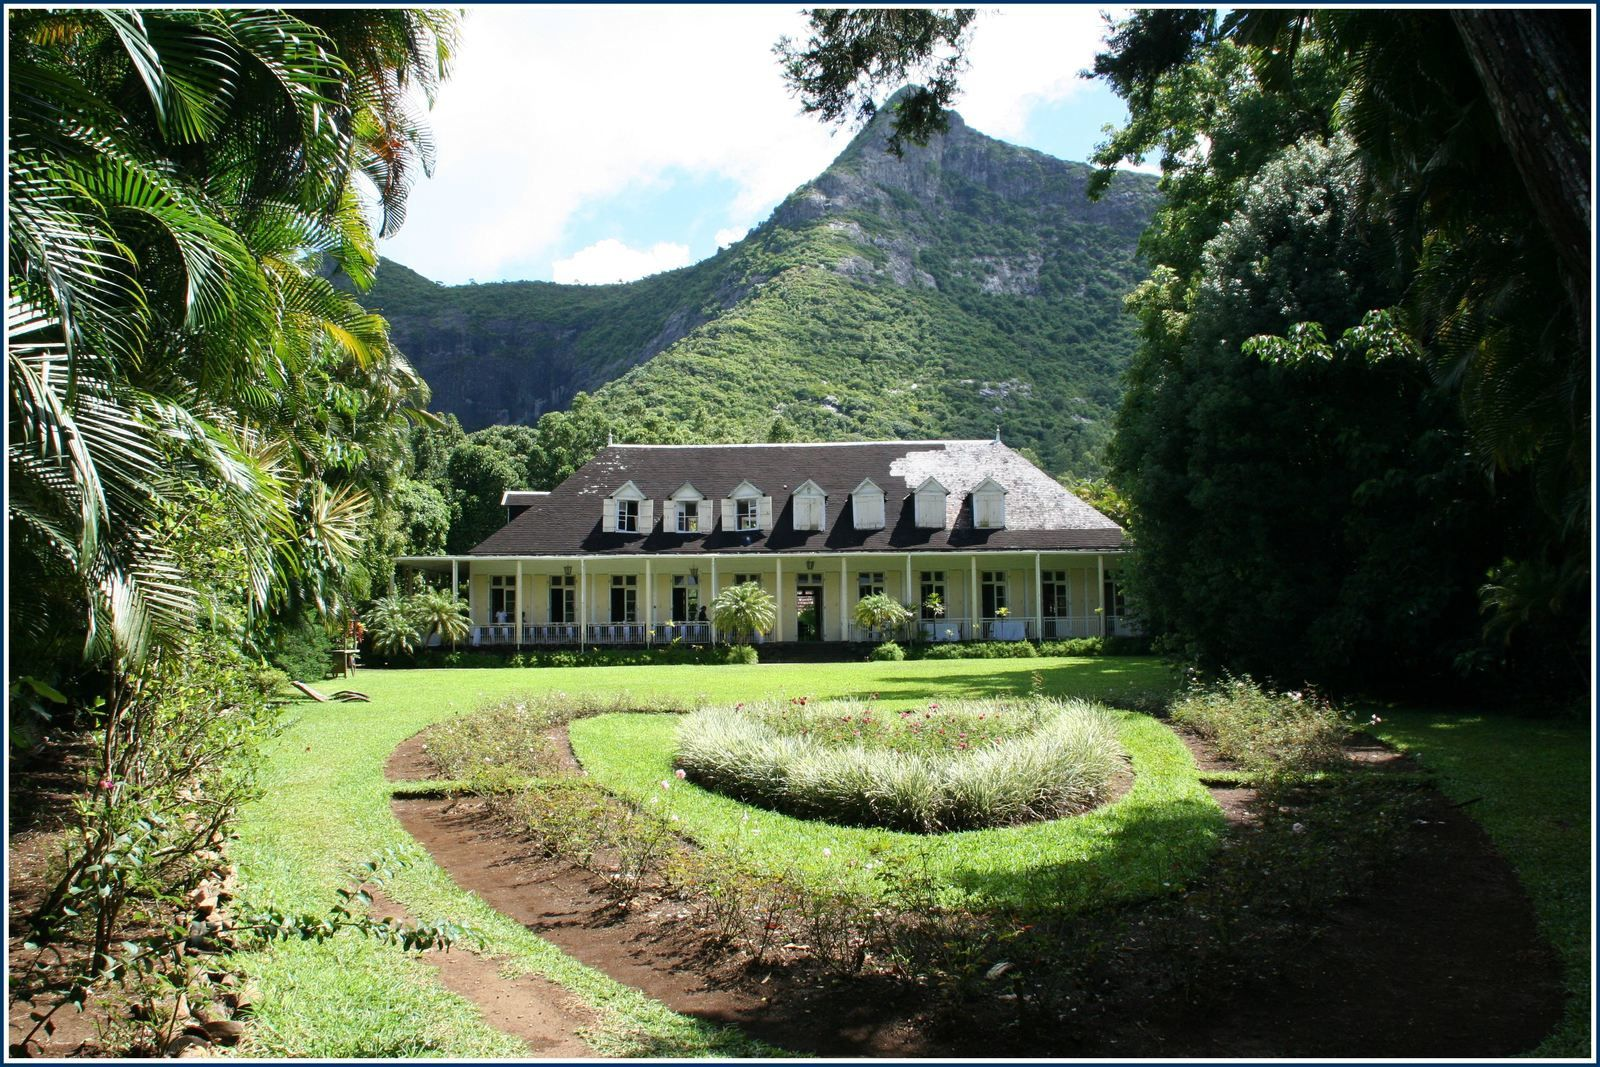 320 - Île Maurice  avril  2019, Belles demeures anciennes de Mauritius, 1/ Demeure Eureka, rivière Moka,  photos © GeoMar